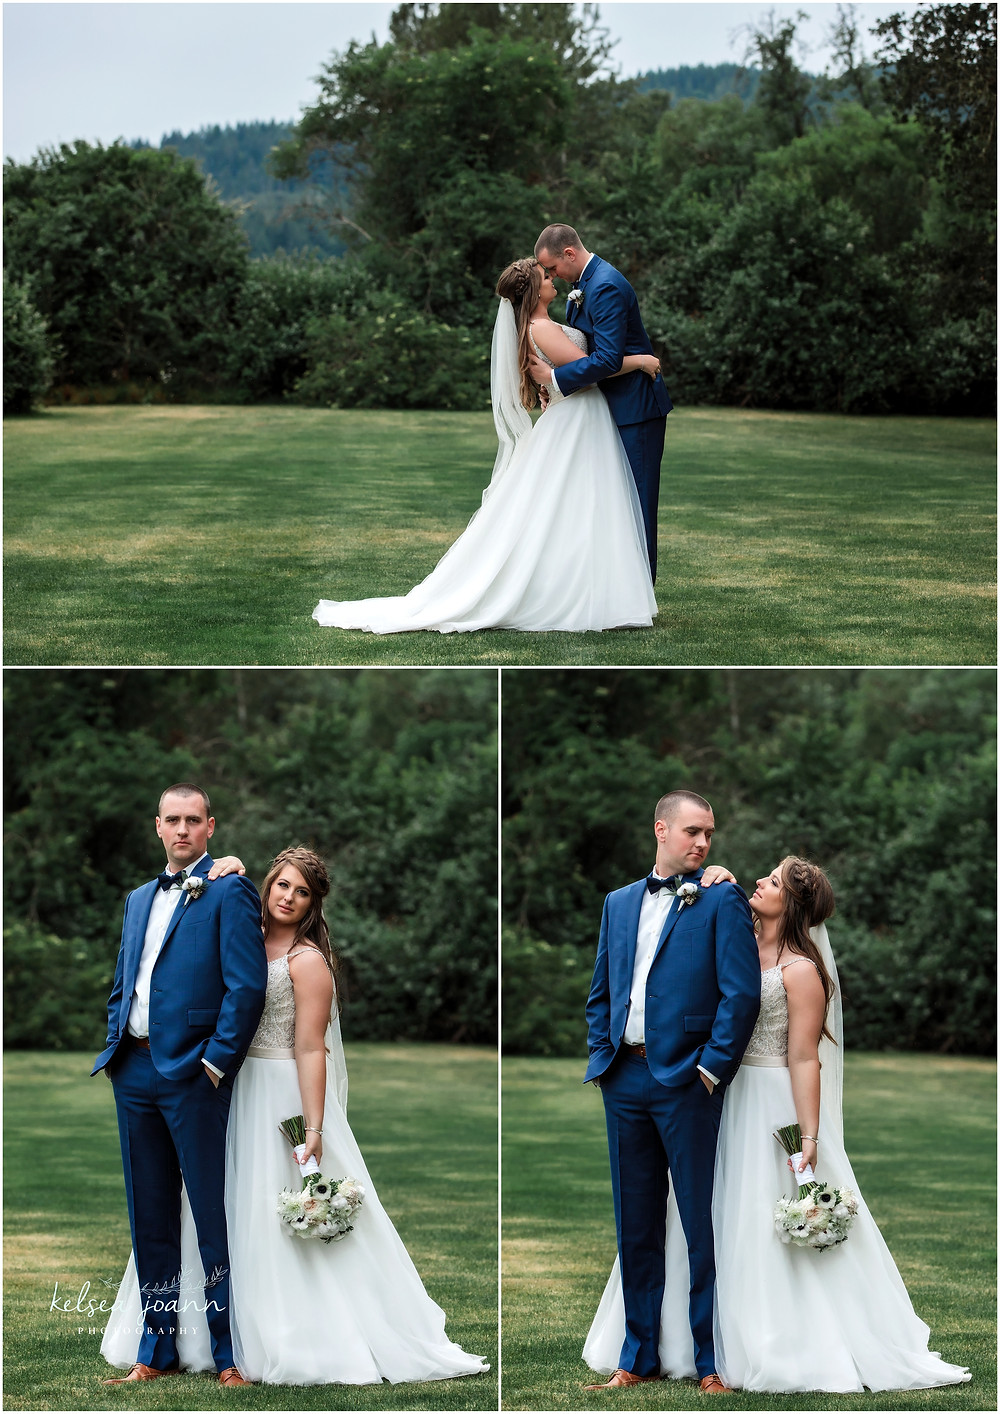 Eugene_Oregon_Wedding_Photographer_Bride_and_Groom_Portraits